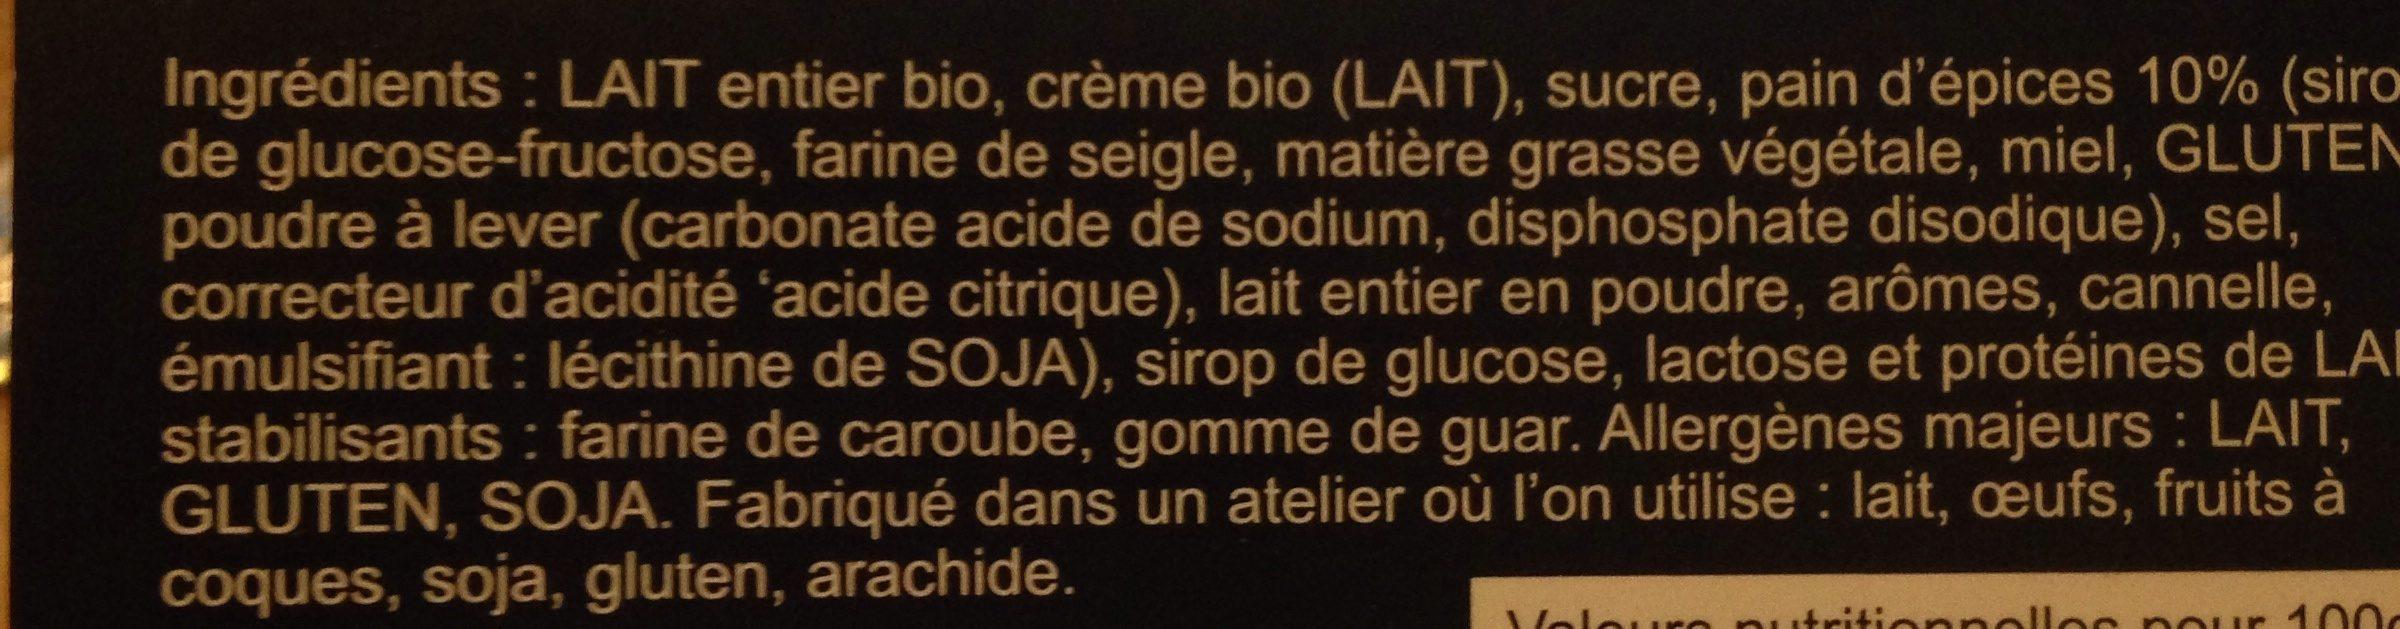 Glace pain d'epices - Ingrediënten - fr